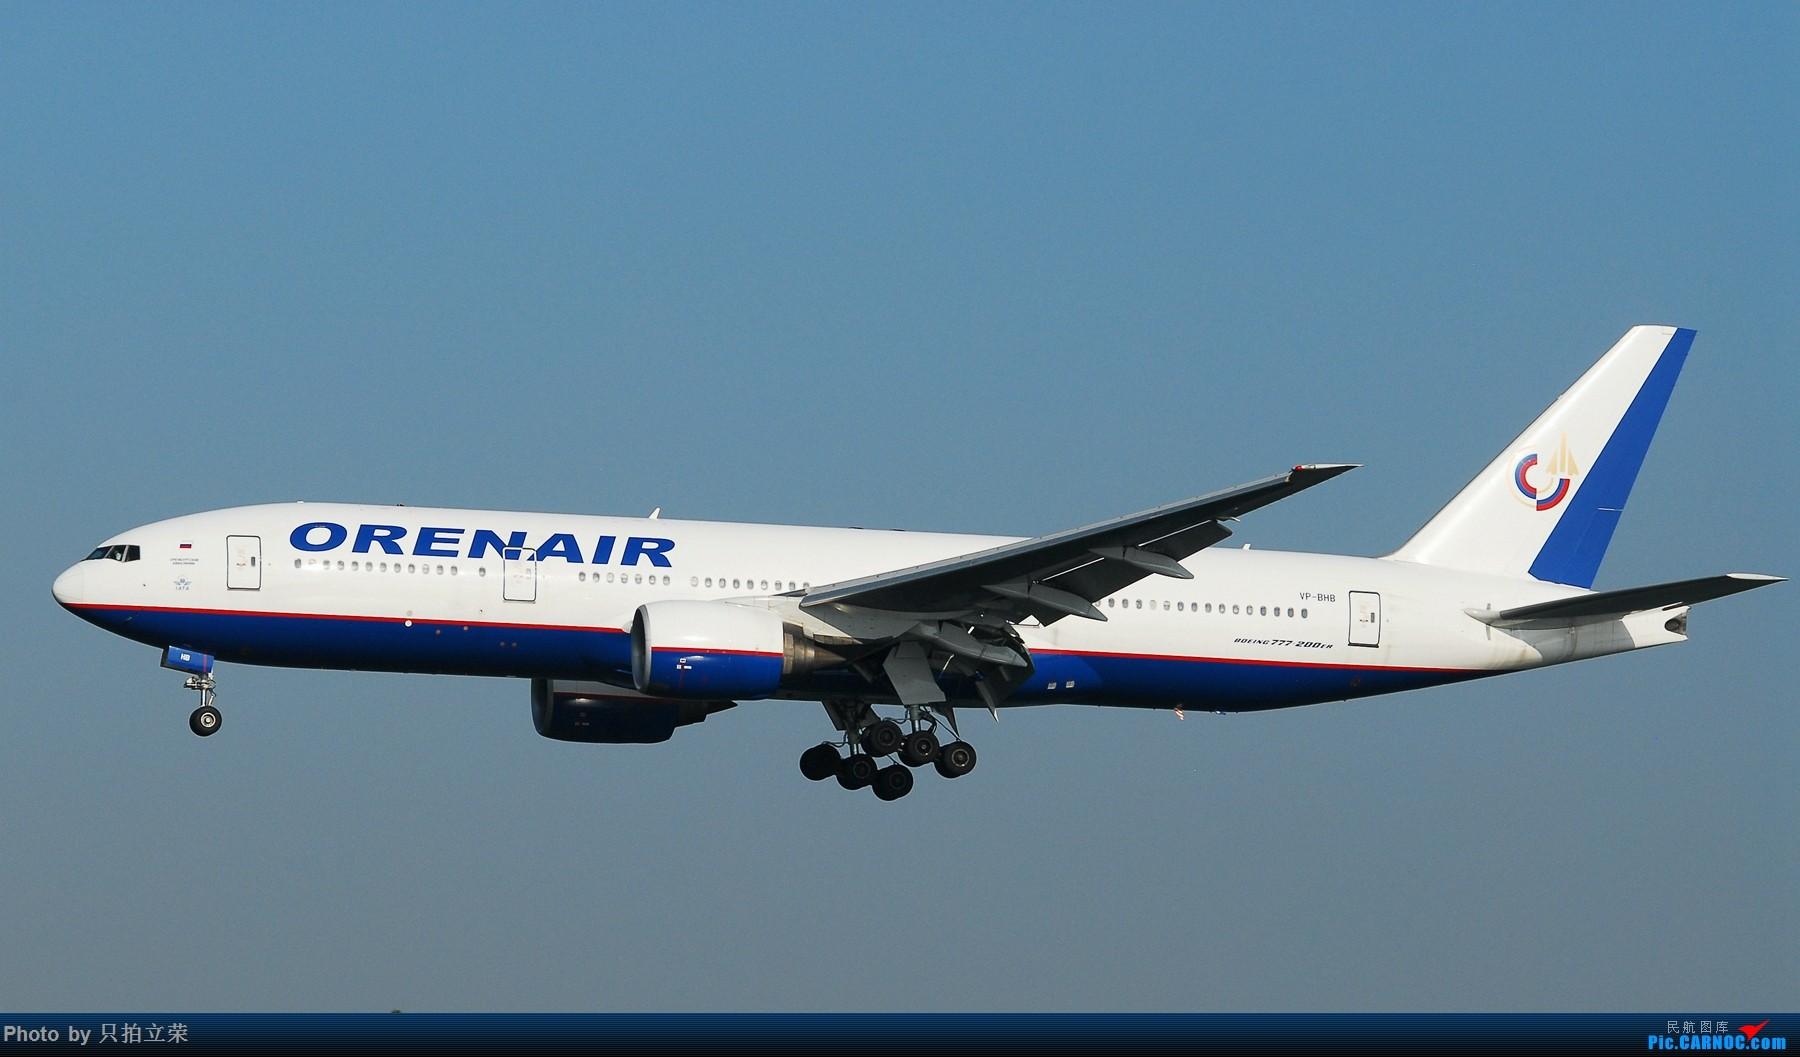 Re:[原创]长沙黄花机场的稀奇货们 BOEING 777-200ER VP-BHB 中国长沙黄花国际机场